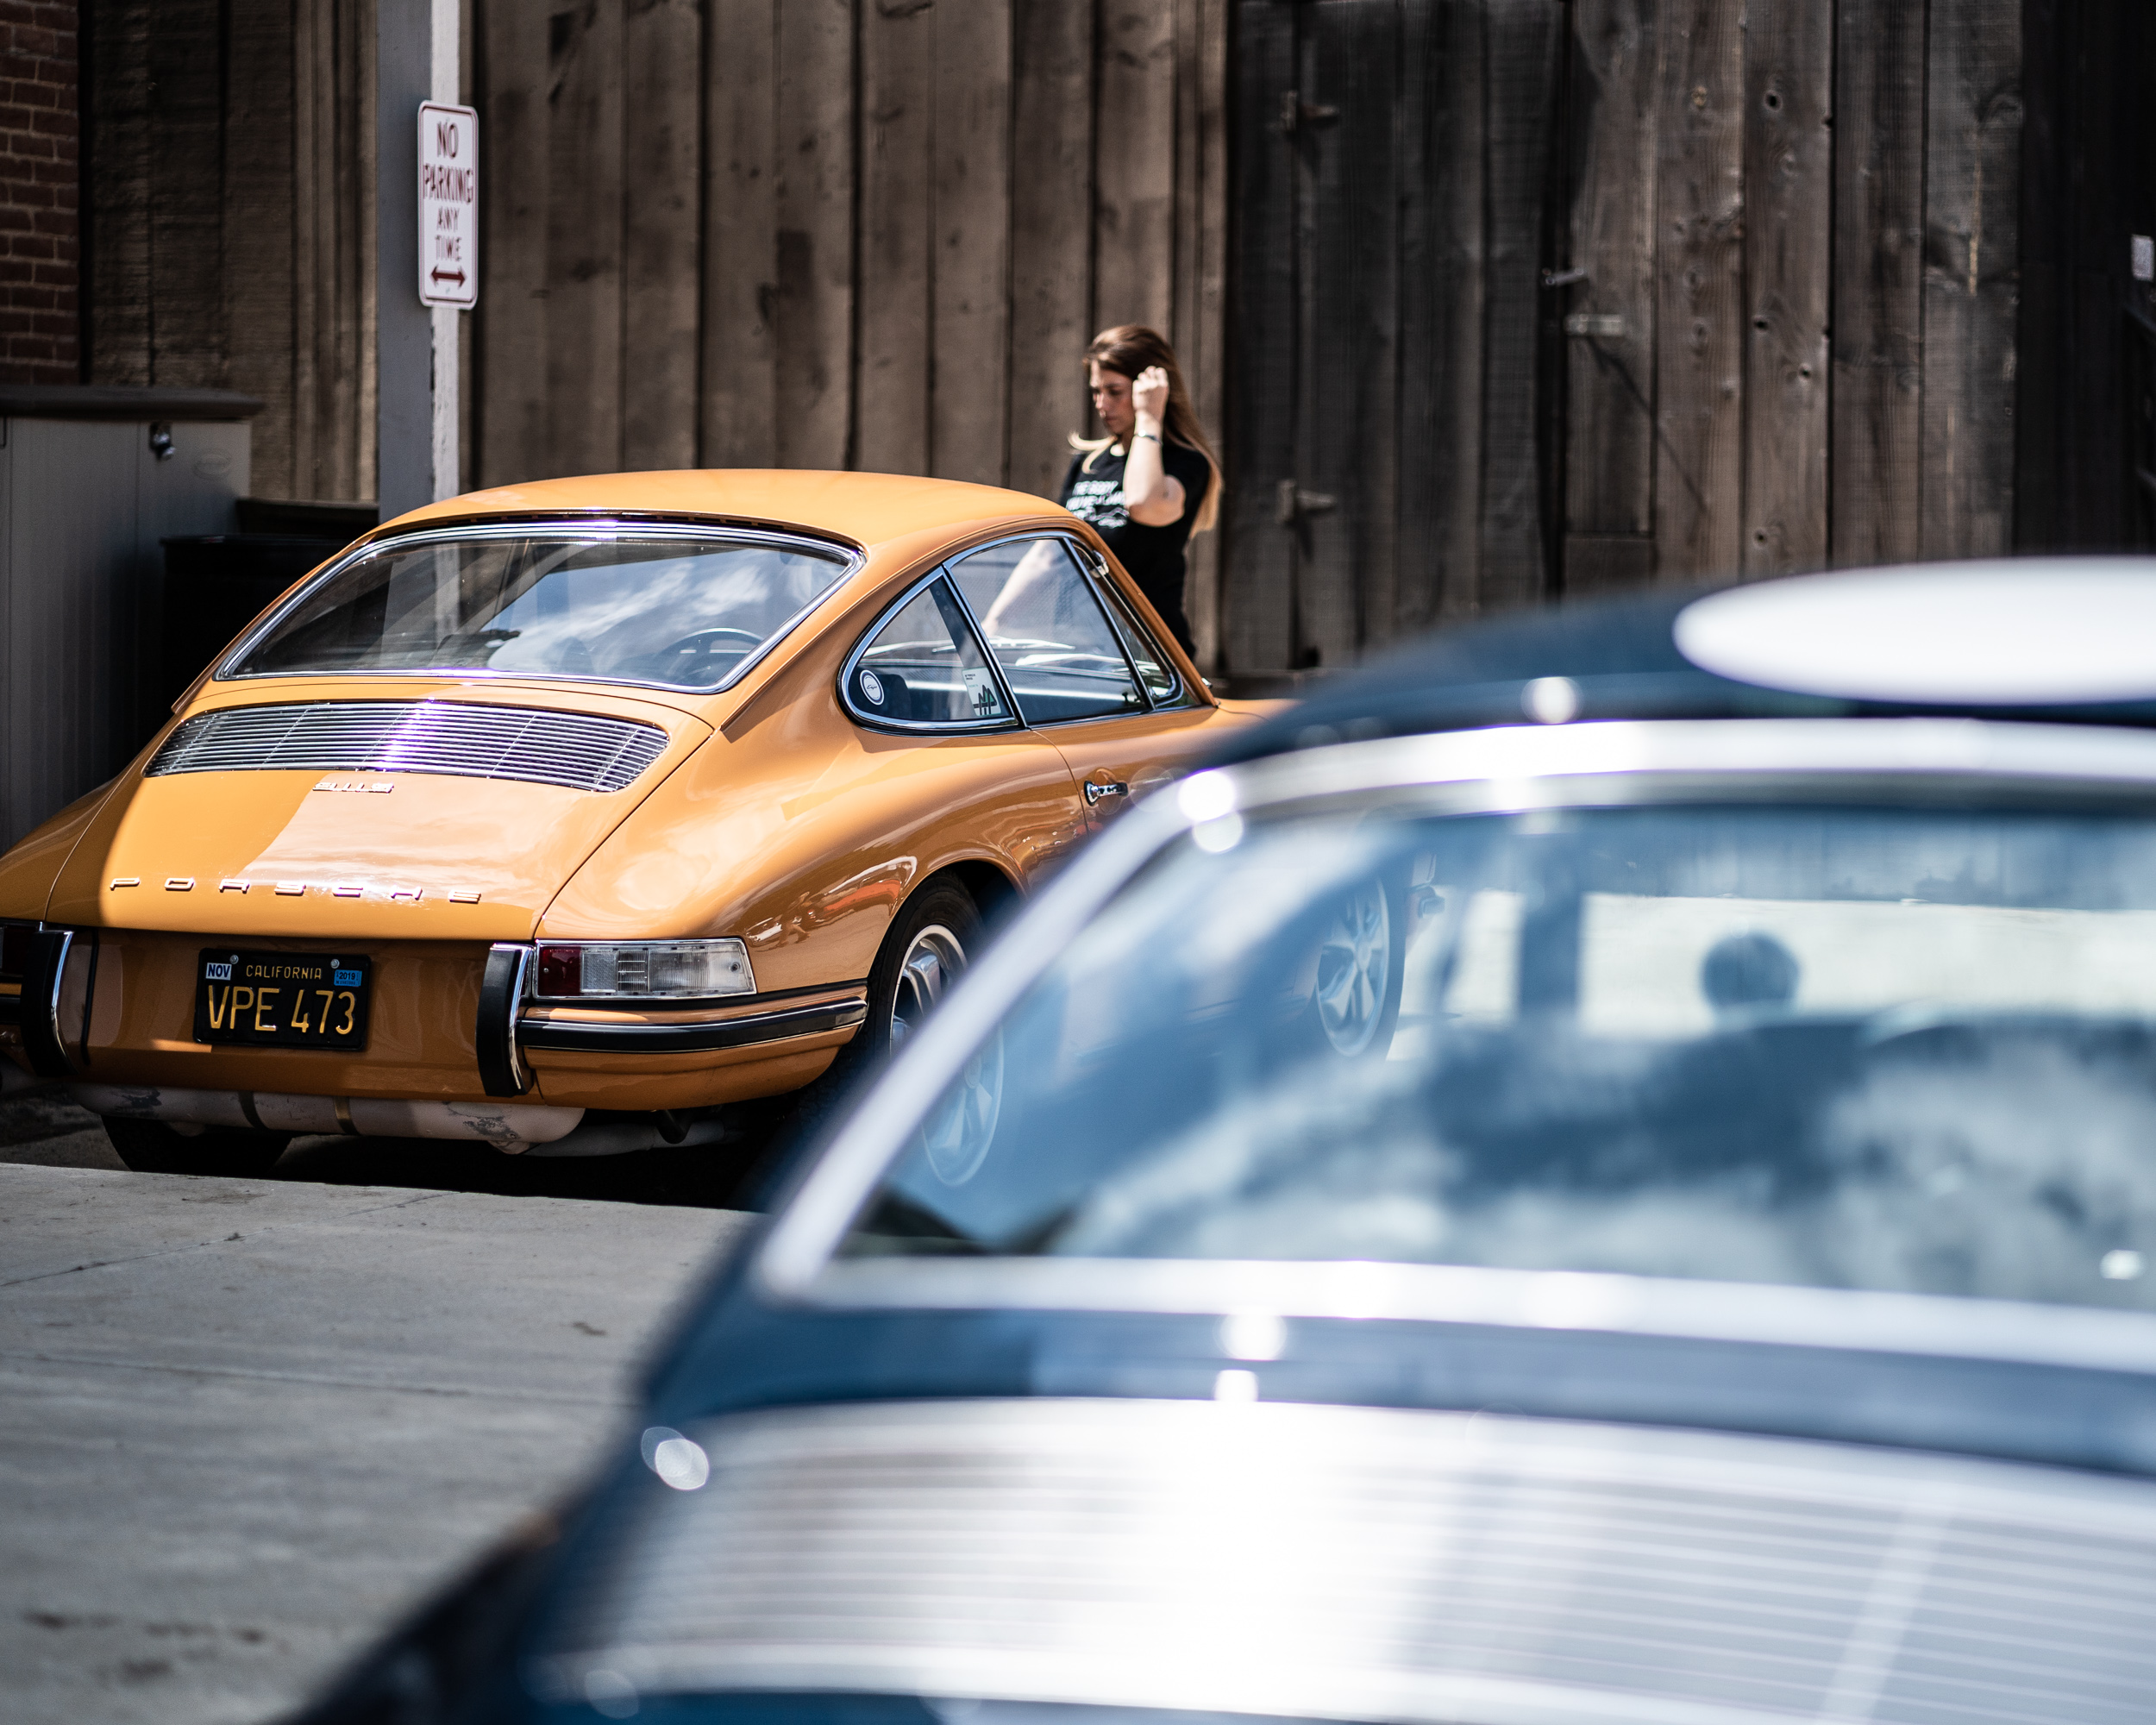 Luftgekuhlt 6 Classic 911 Universal Studios